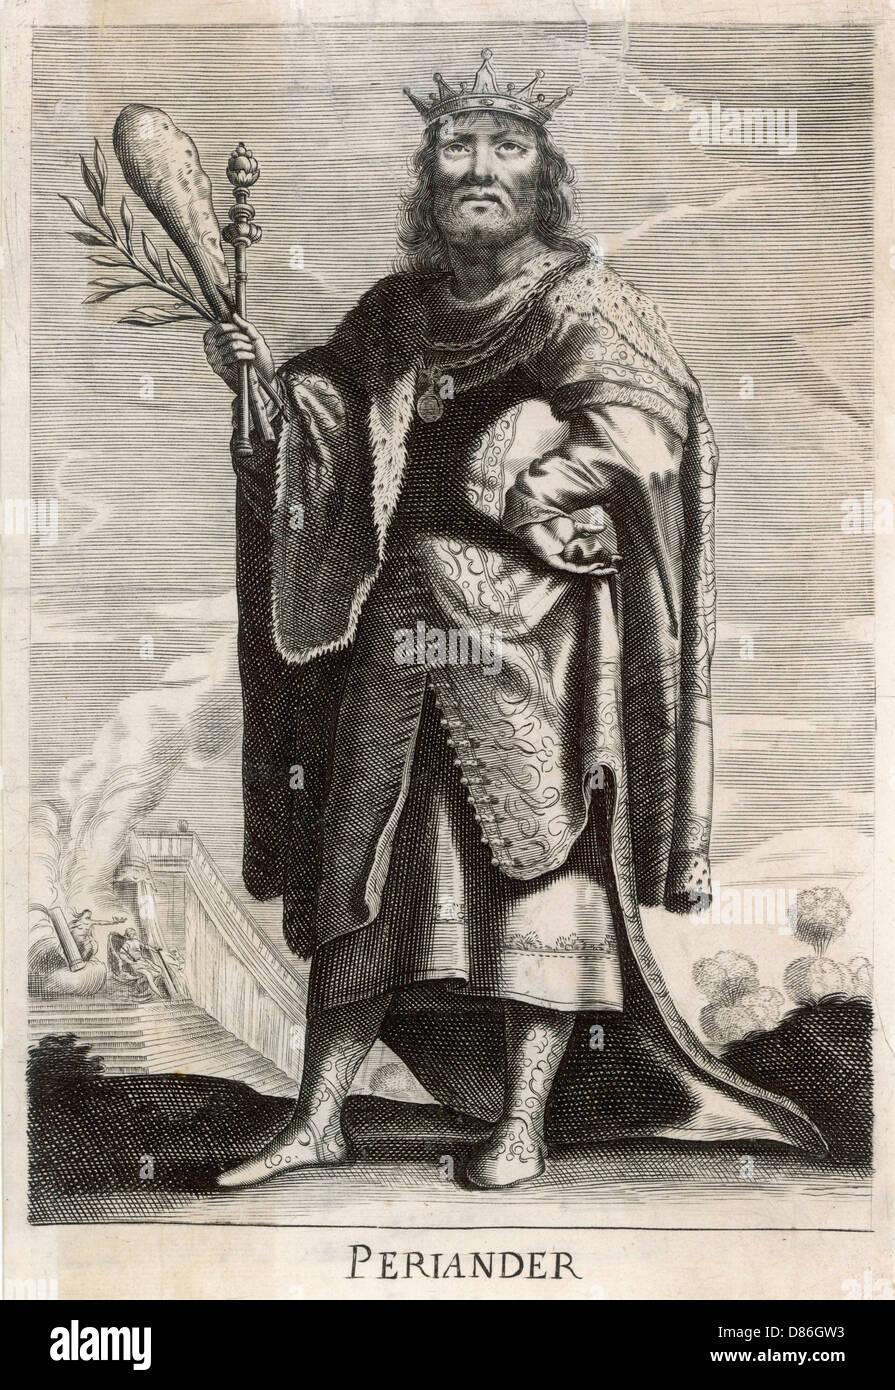 Periander  Greek Royalty - Stock Image